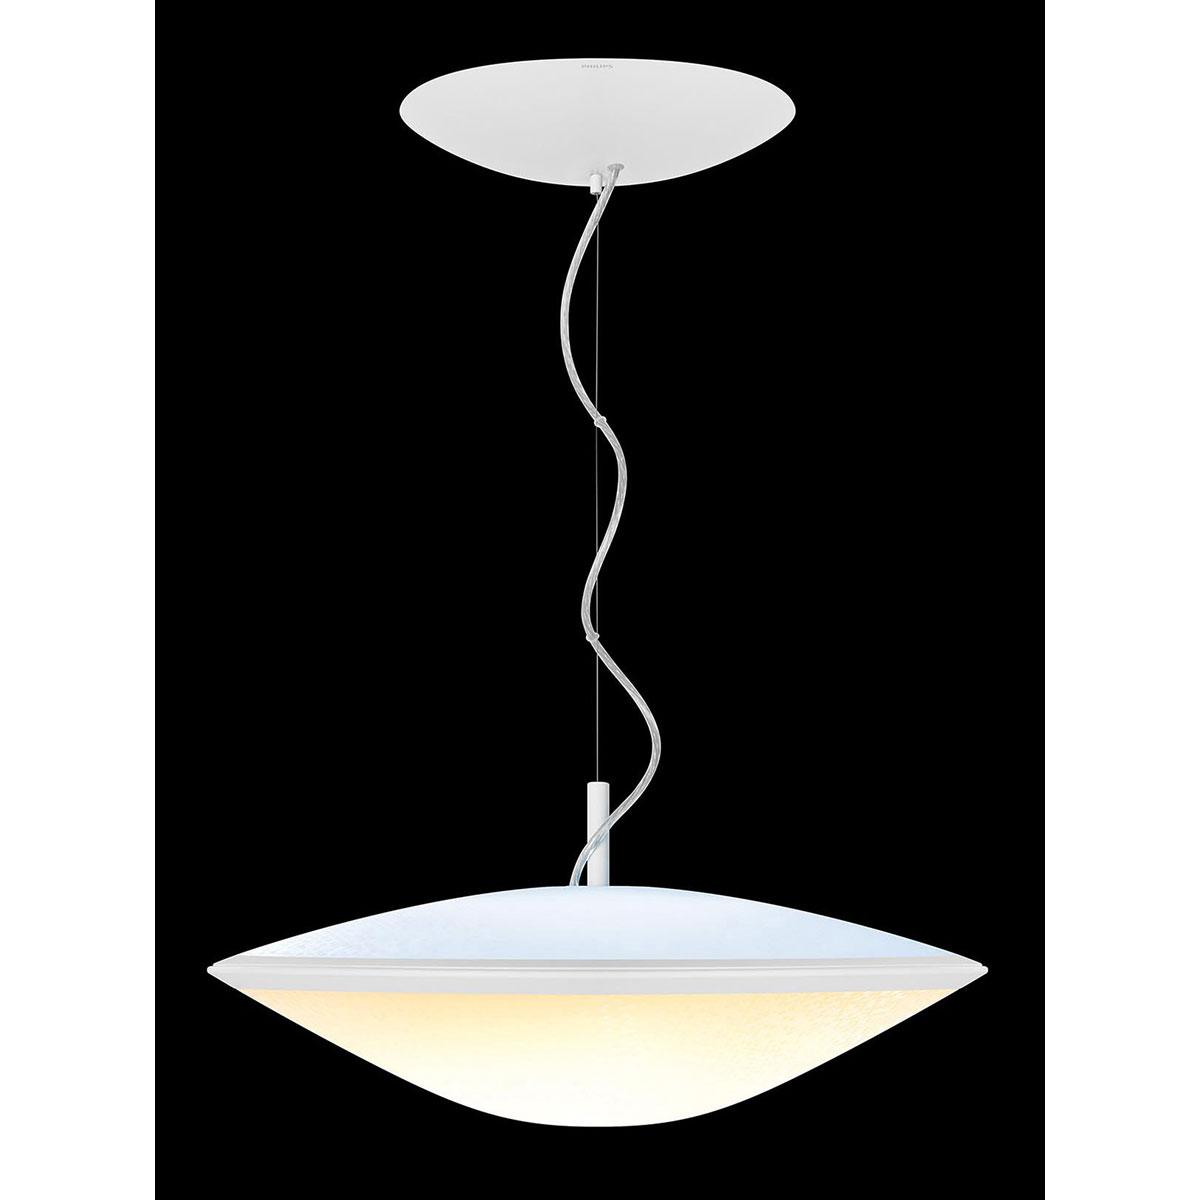 philips hue phoenix hanglamp. Black Bedroom Furniture Sets. Home Design Ideas